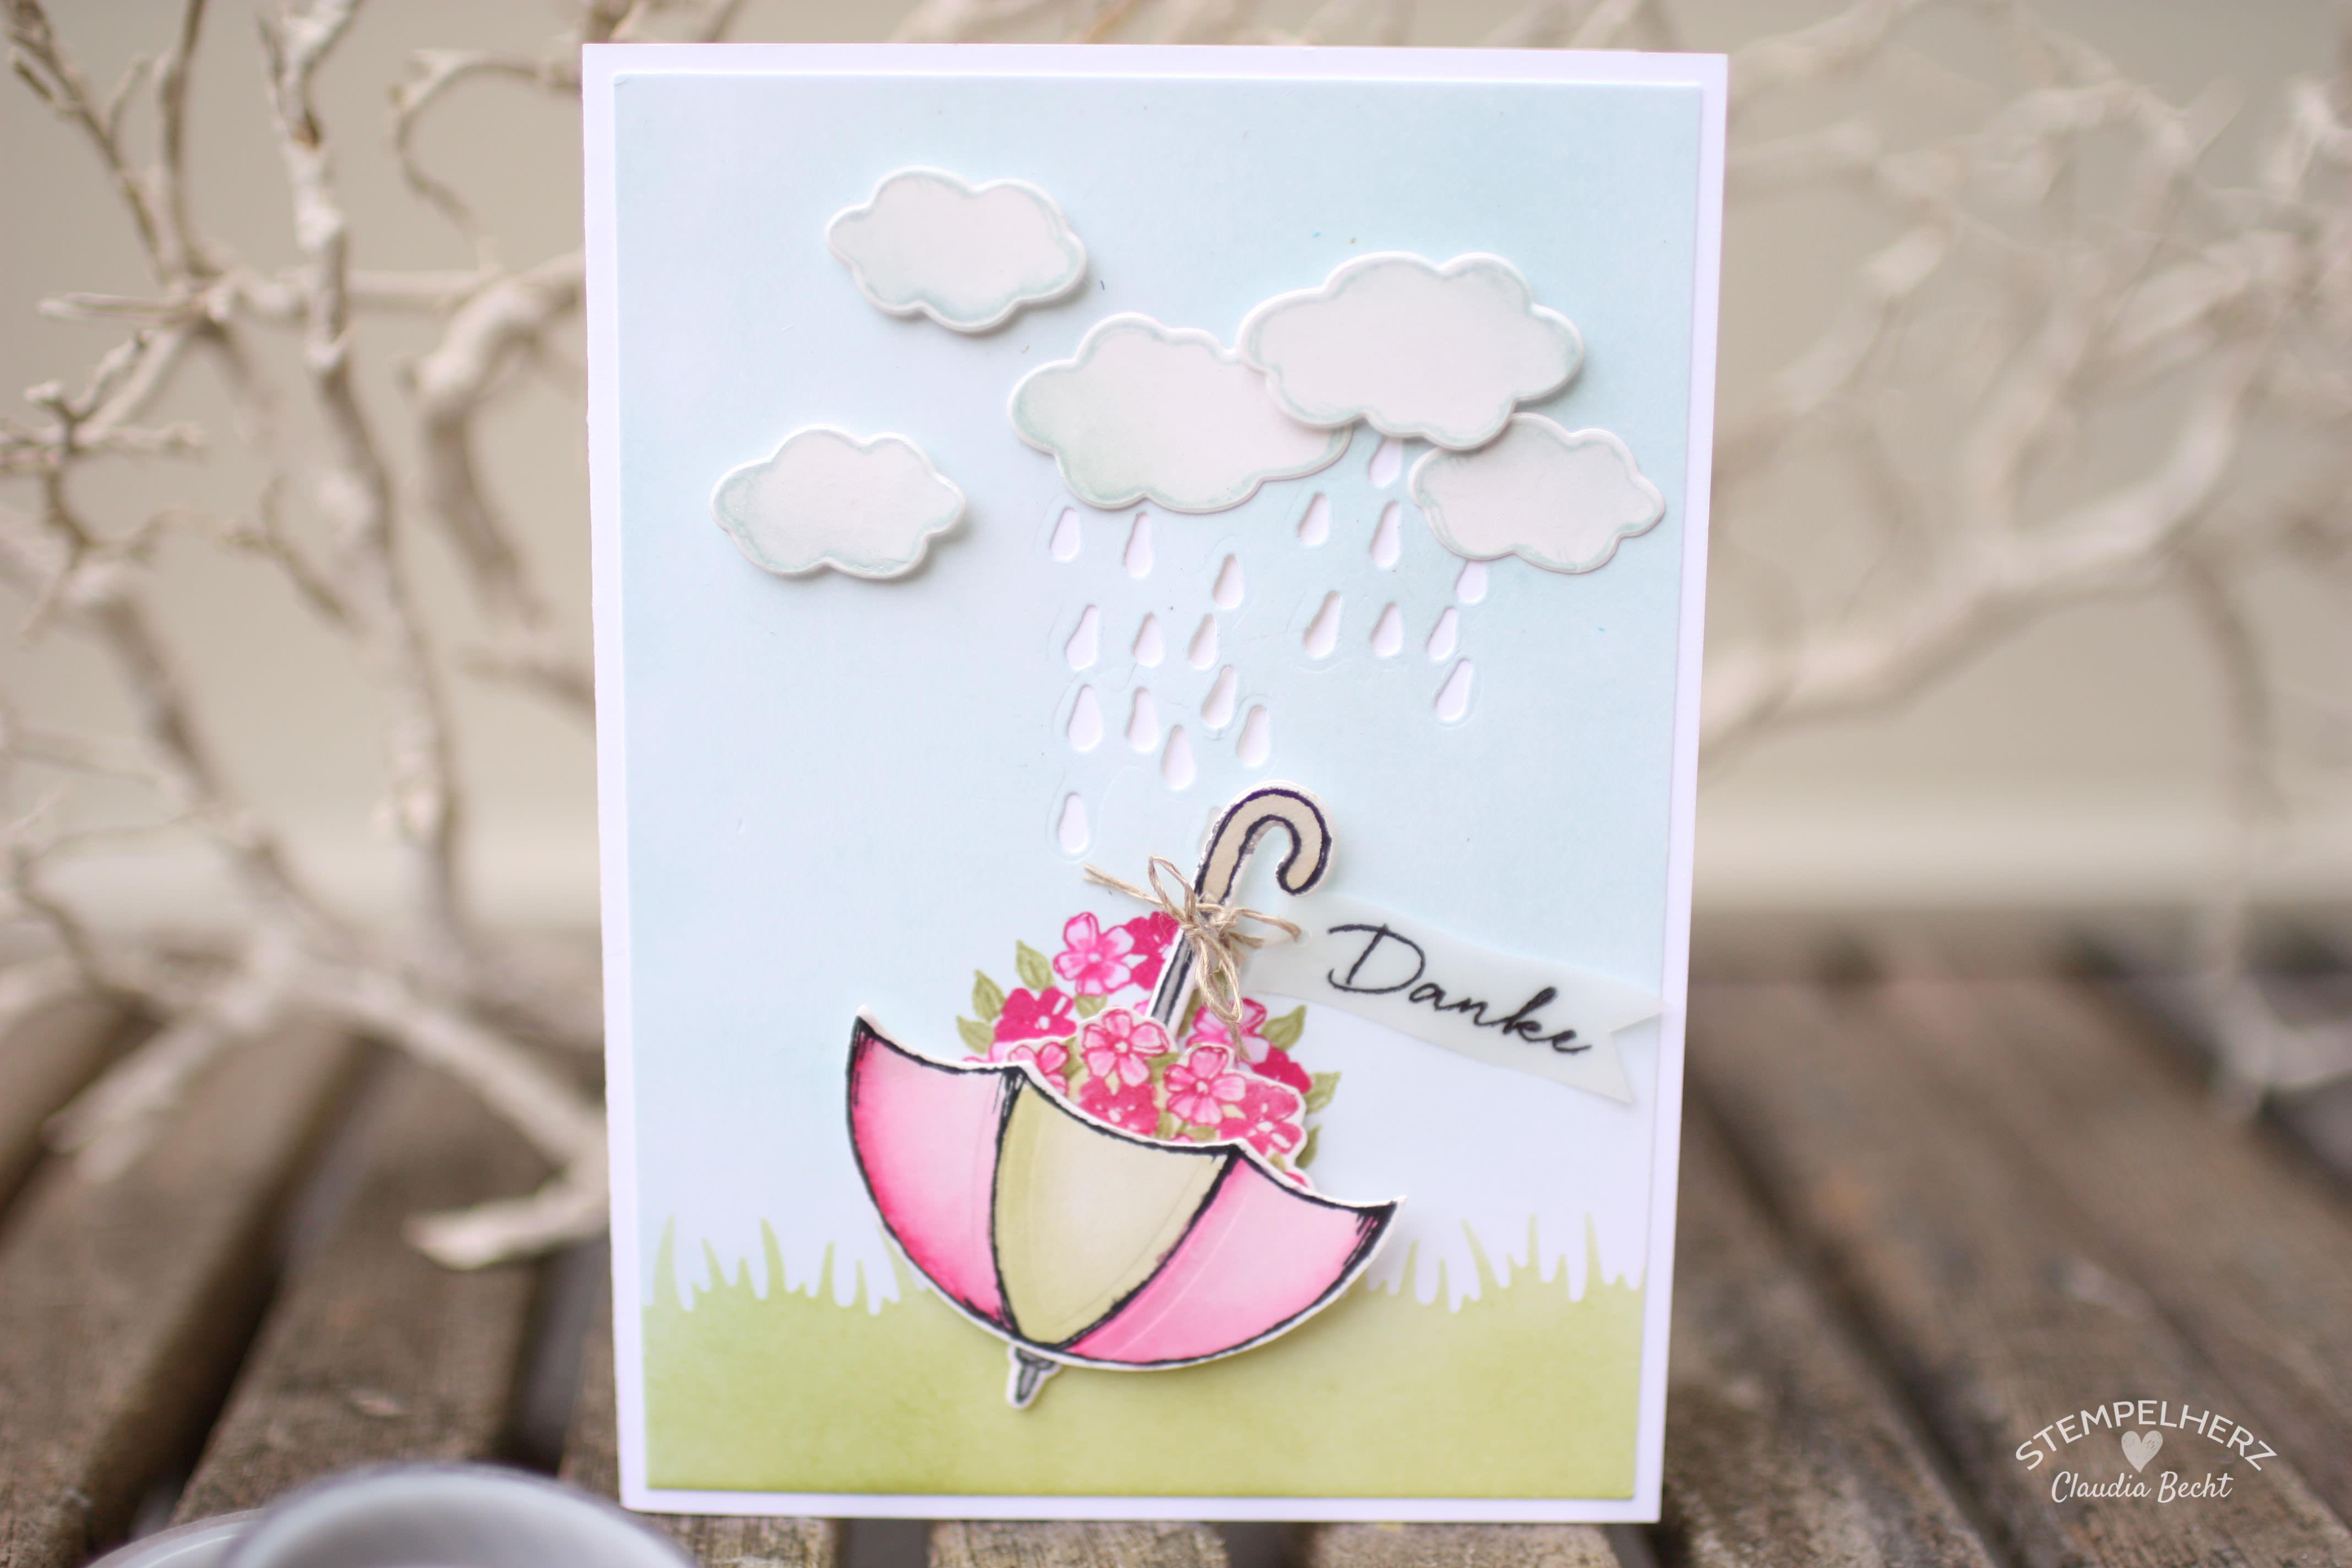 Stampin Up - Stempelherz - Grußkarte - Dankeskarte - Stempelset Donnerwetter - Regenschirm auf dem Kopf 01